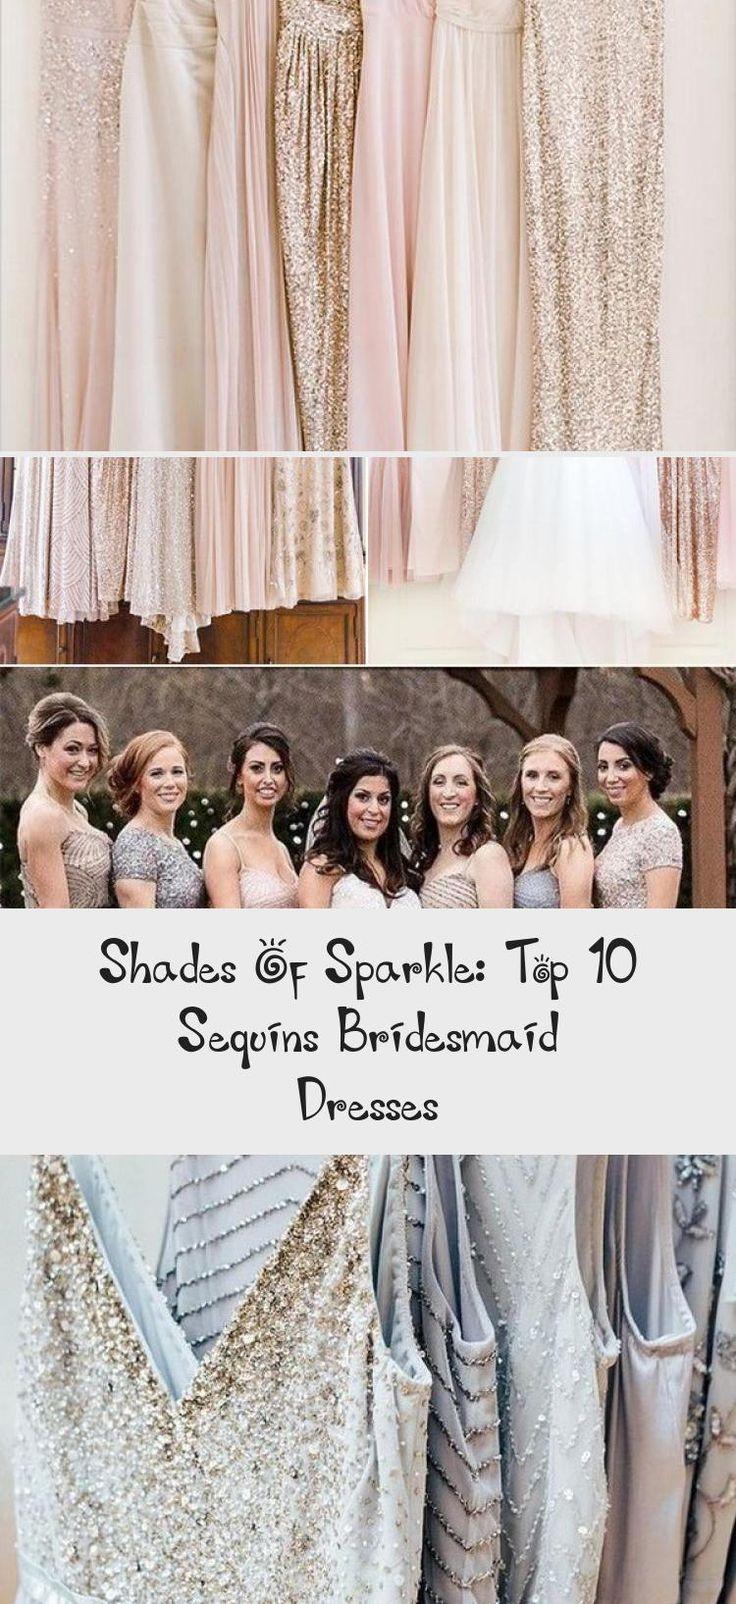 mix and match neutral glitter bridesmaid dresses #emmalovesweddings #weddingideas2019 #BridesmaidDressesMuslim #BridesmaidDressesVintage #BlushBridesmaidDresses #BridesmaidDressesStyles #GoldBridesmaidDresses